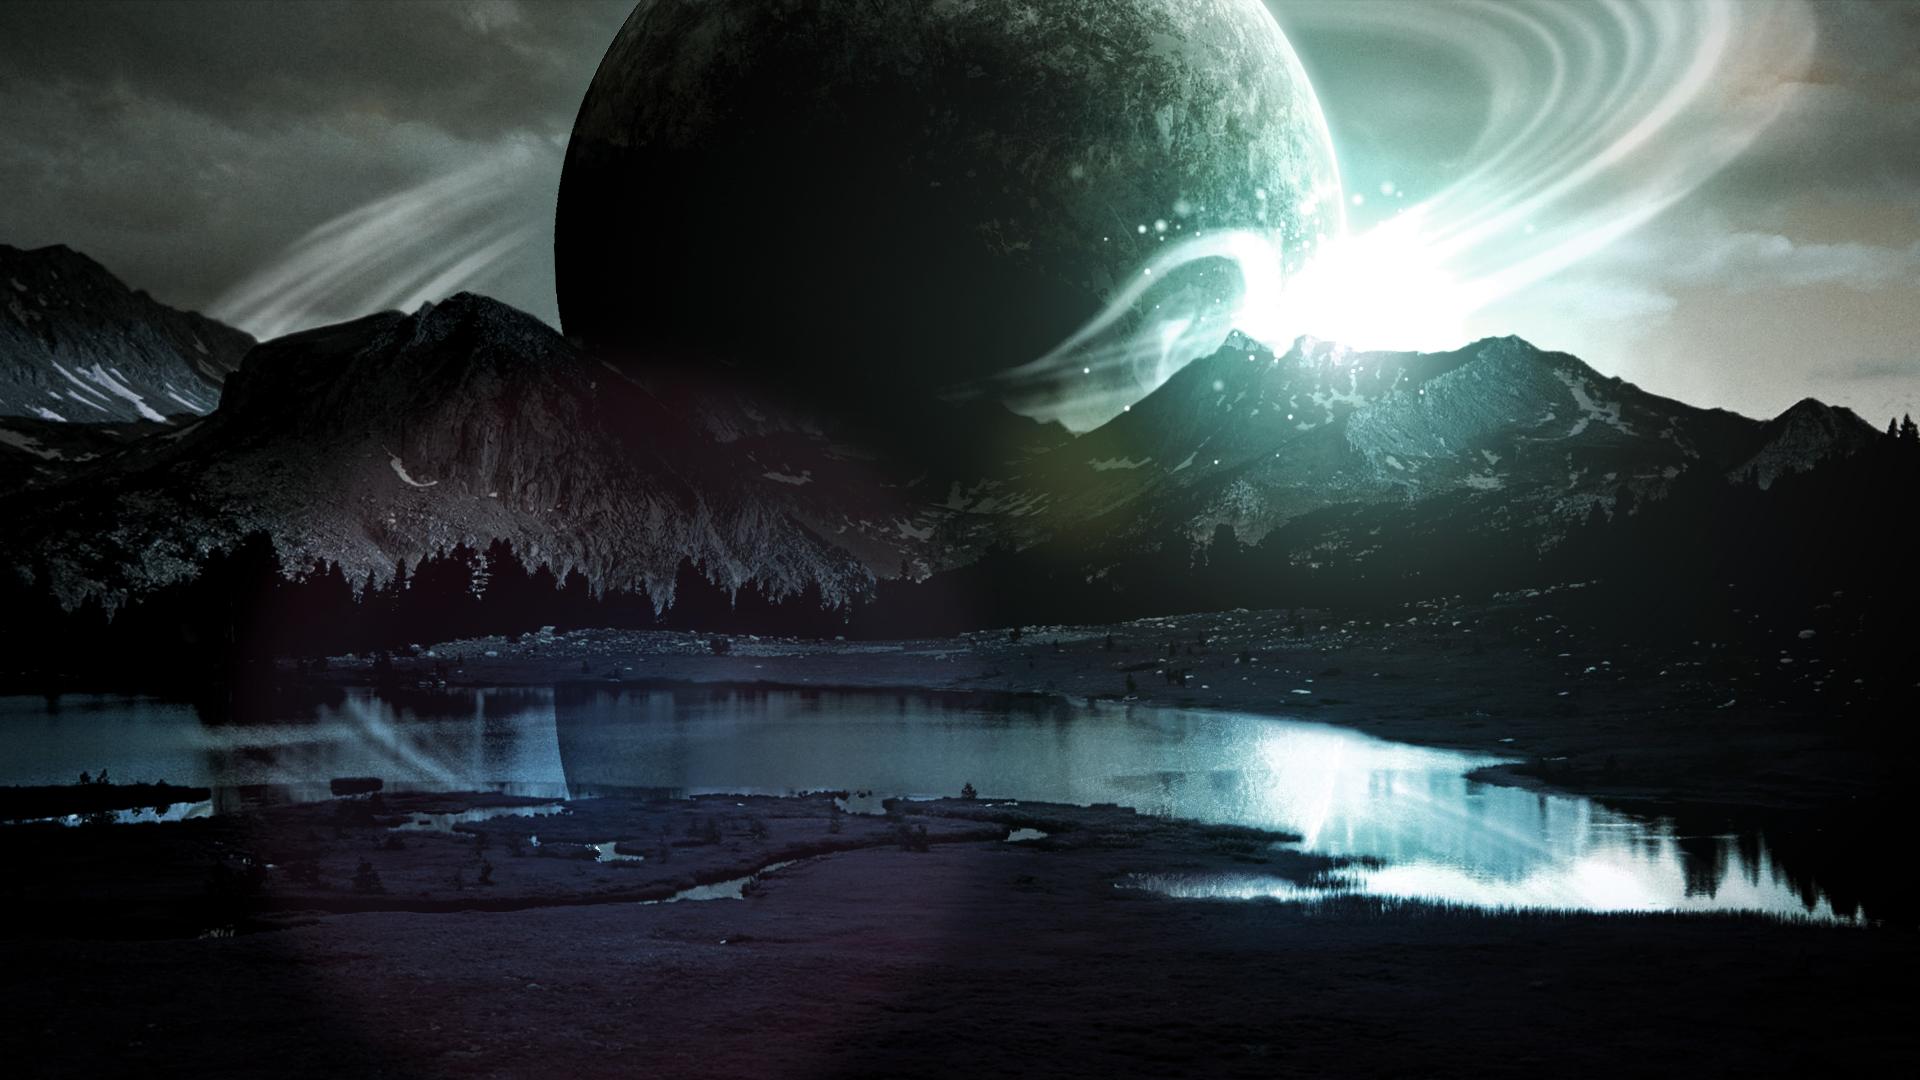 Rising Planet (Wallpaper) by Hardii on DeviantArt